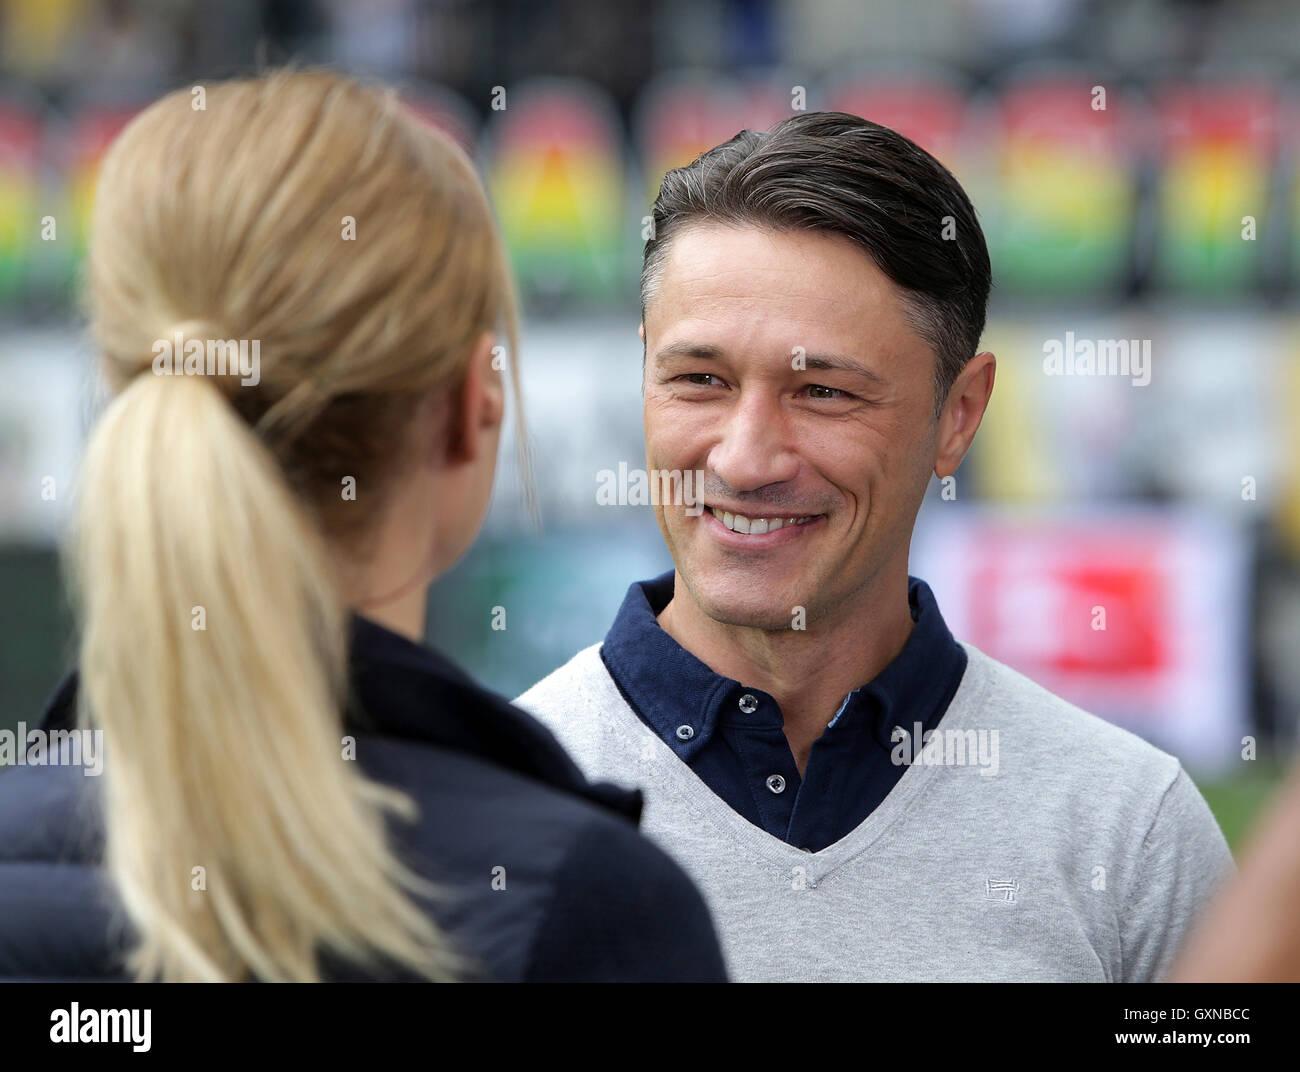 Frankfurt coach Niko Kovac gives an interview ahead of the